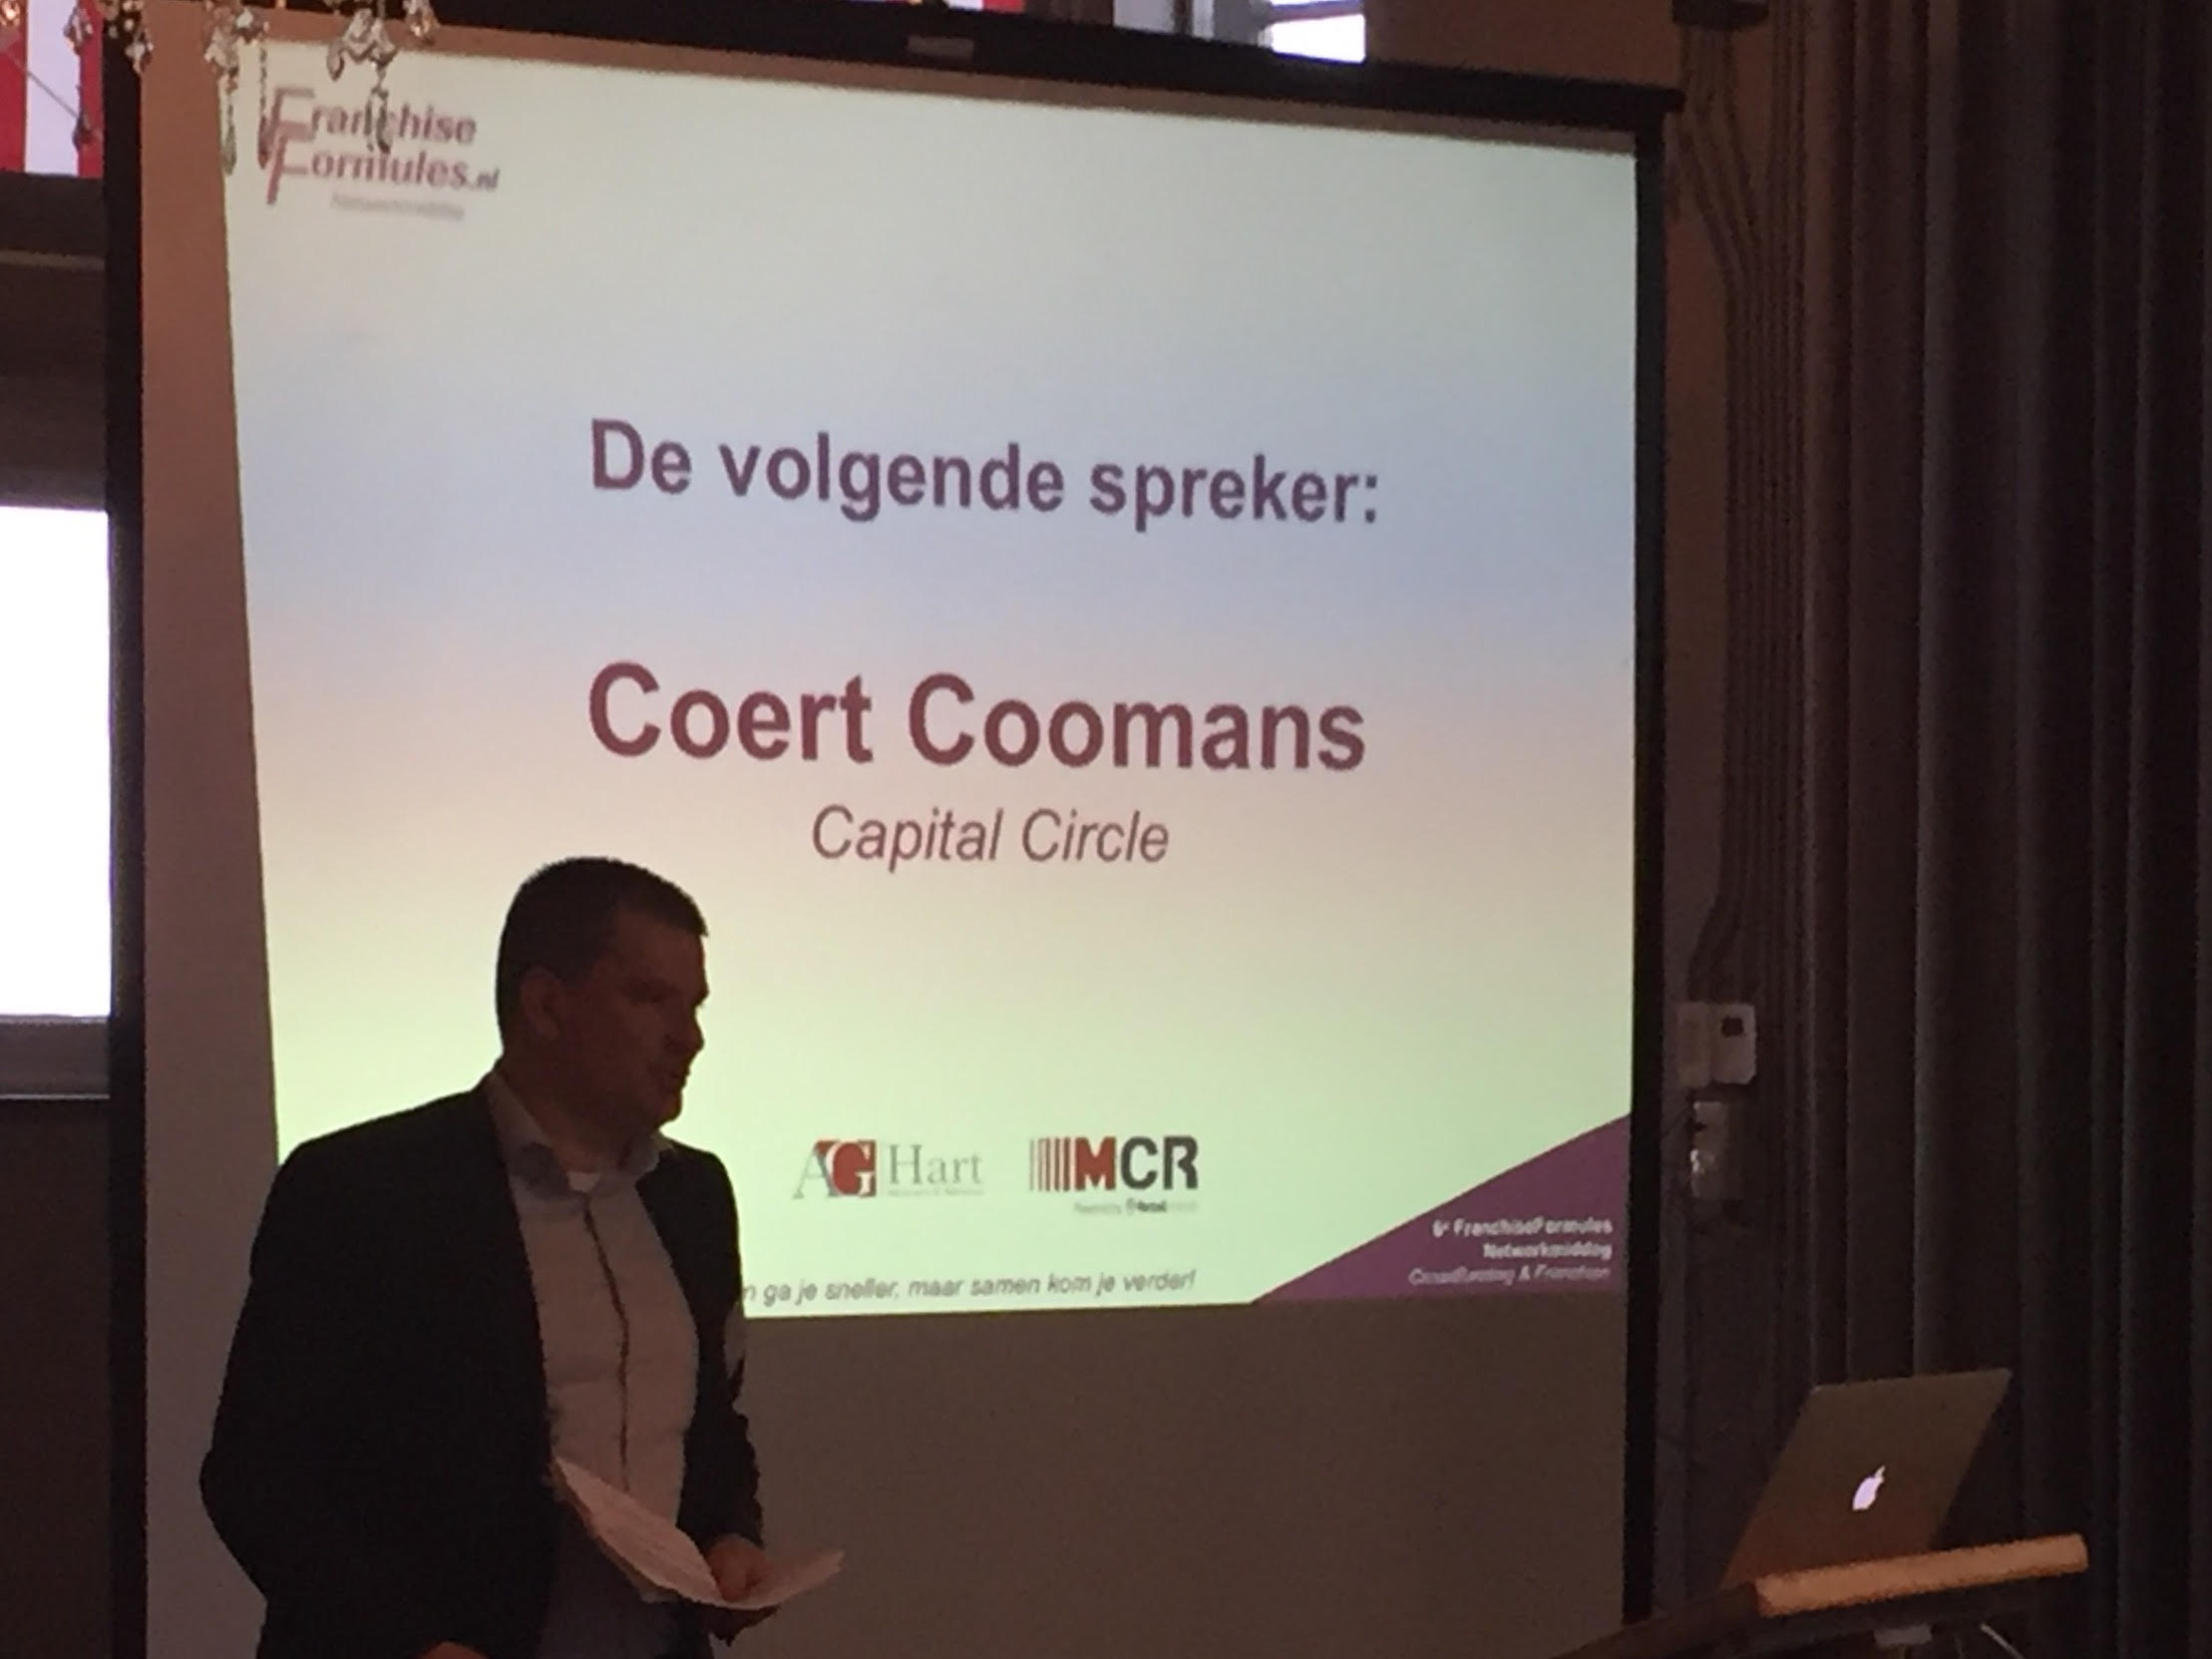 Capital Circle-CEO Coert Coomans hier op archieffoto tijdens de FranchiseFormules Netwerkmiddag 2016 in Hotel New York. Bron: FranchiseFormules.NL